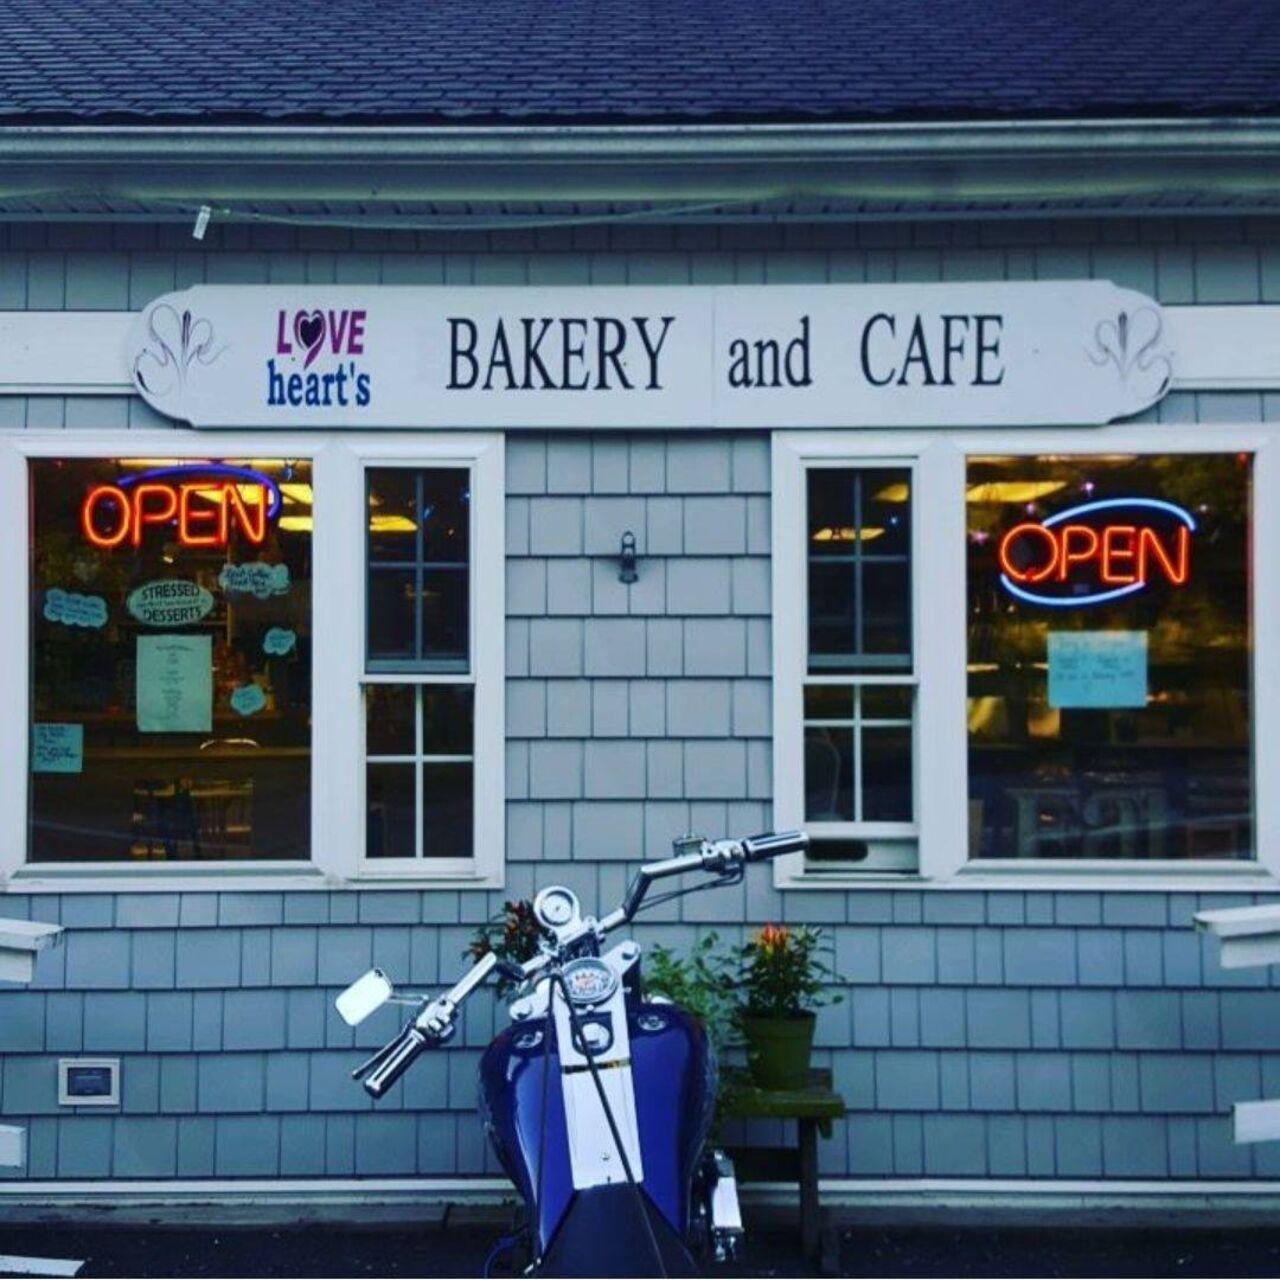 A photo of Love Heart's Bakery and Café